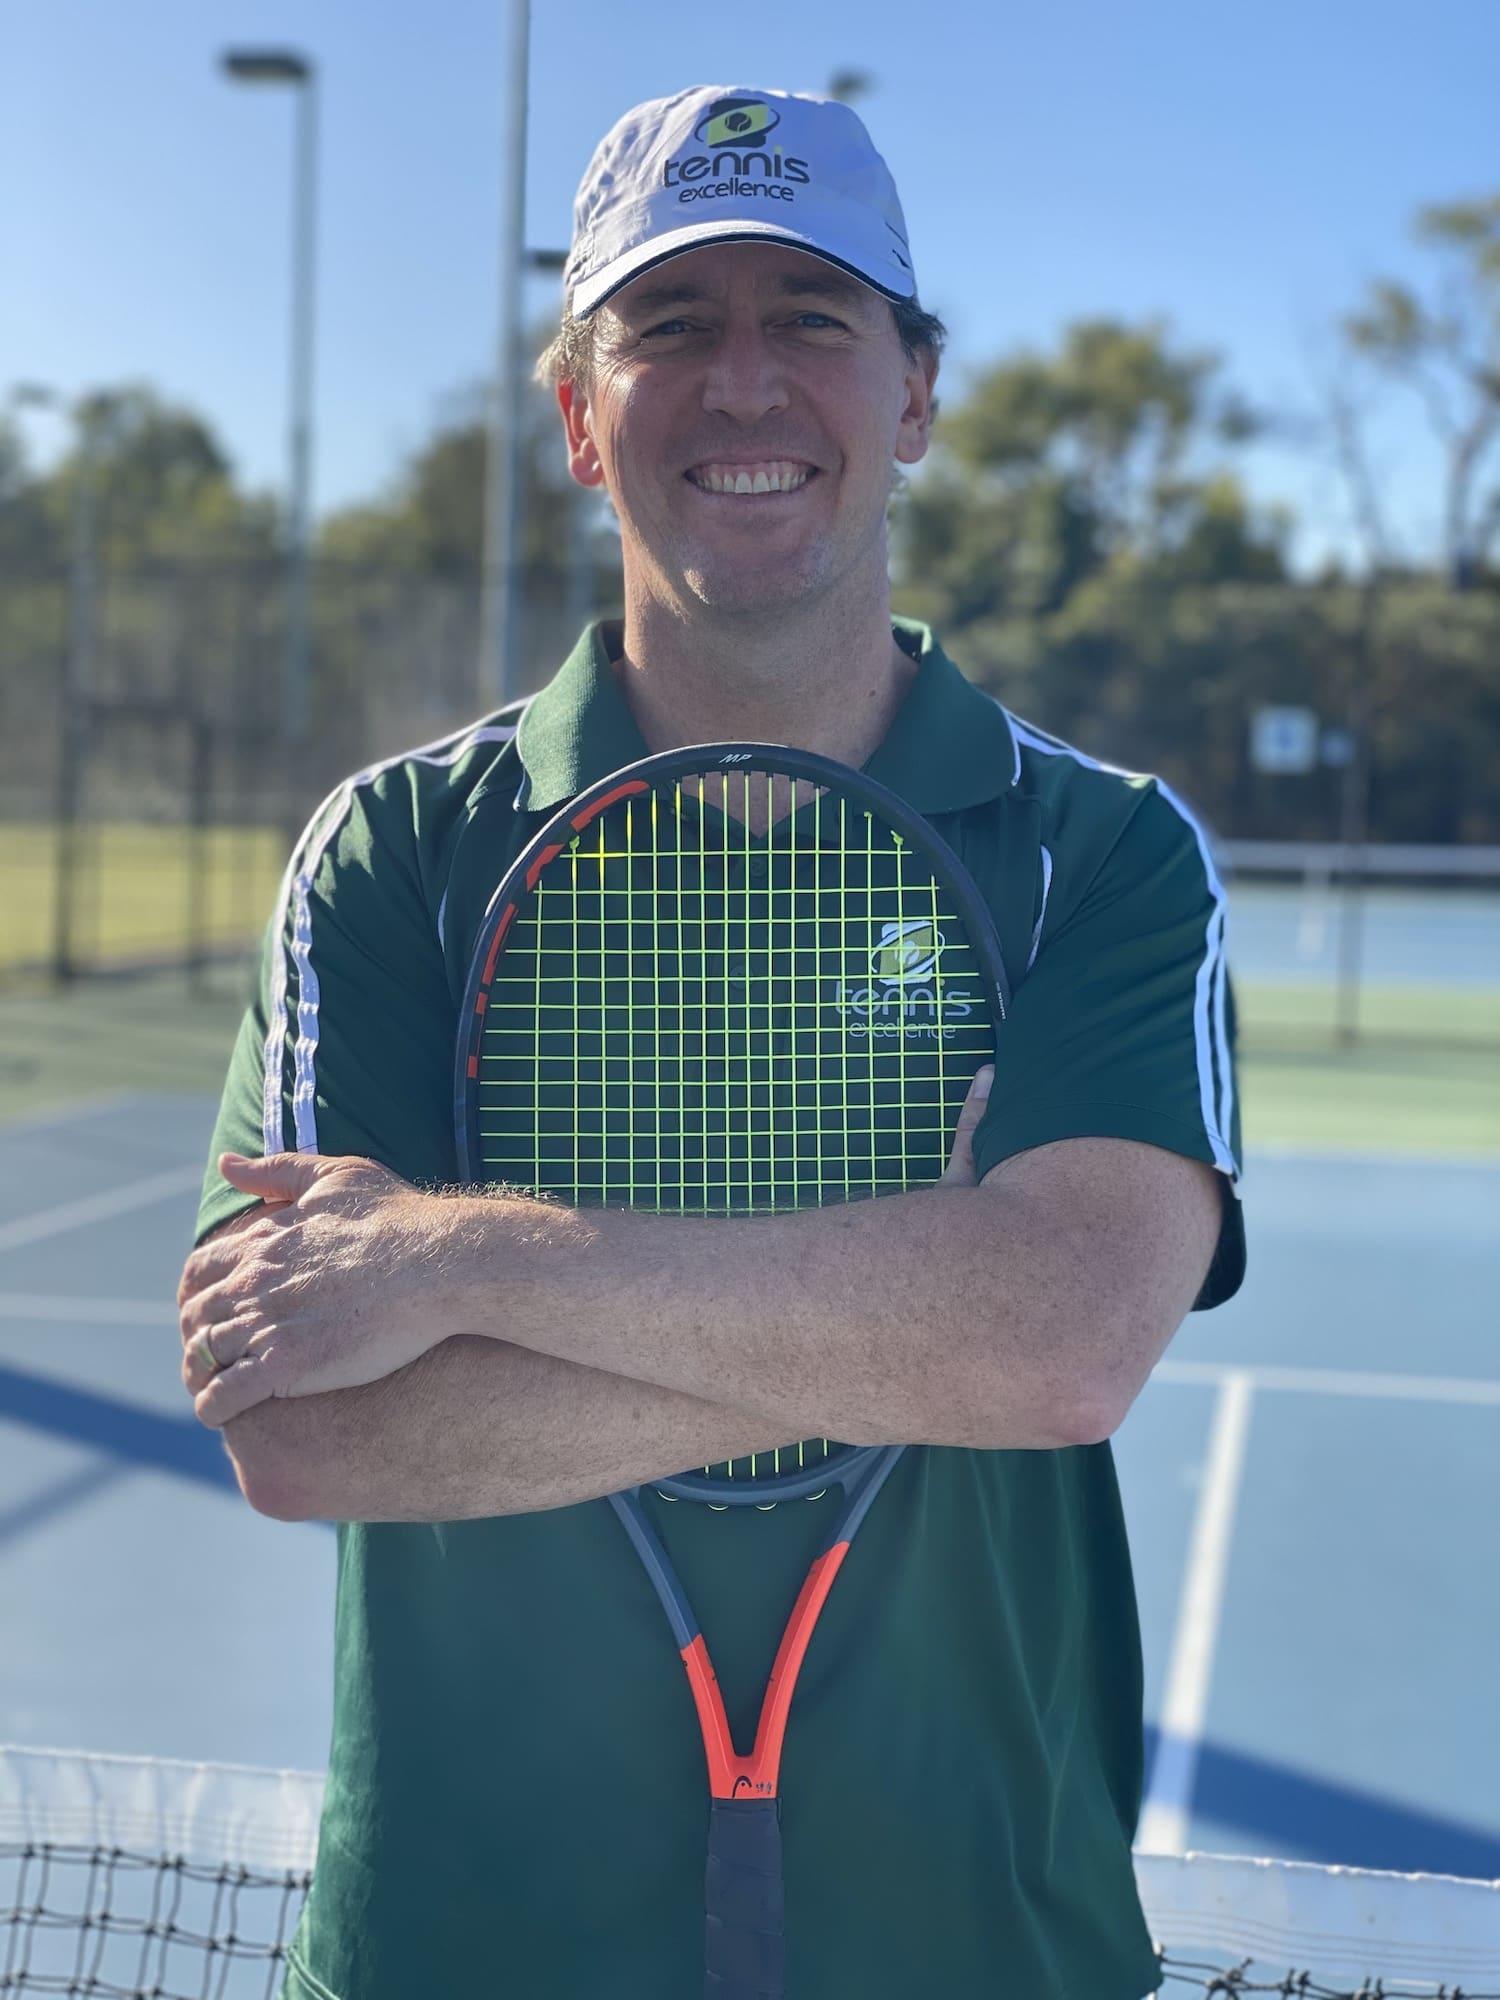 https://www.tennisexcellence.com.au/wp-content/uploads/2020/05/Coach_Dan-Sewell.jpeg